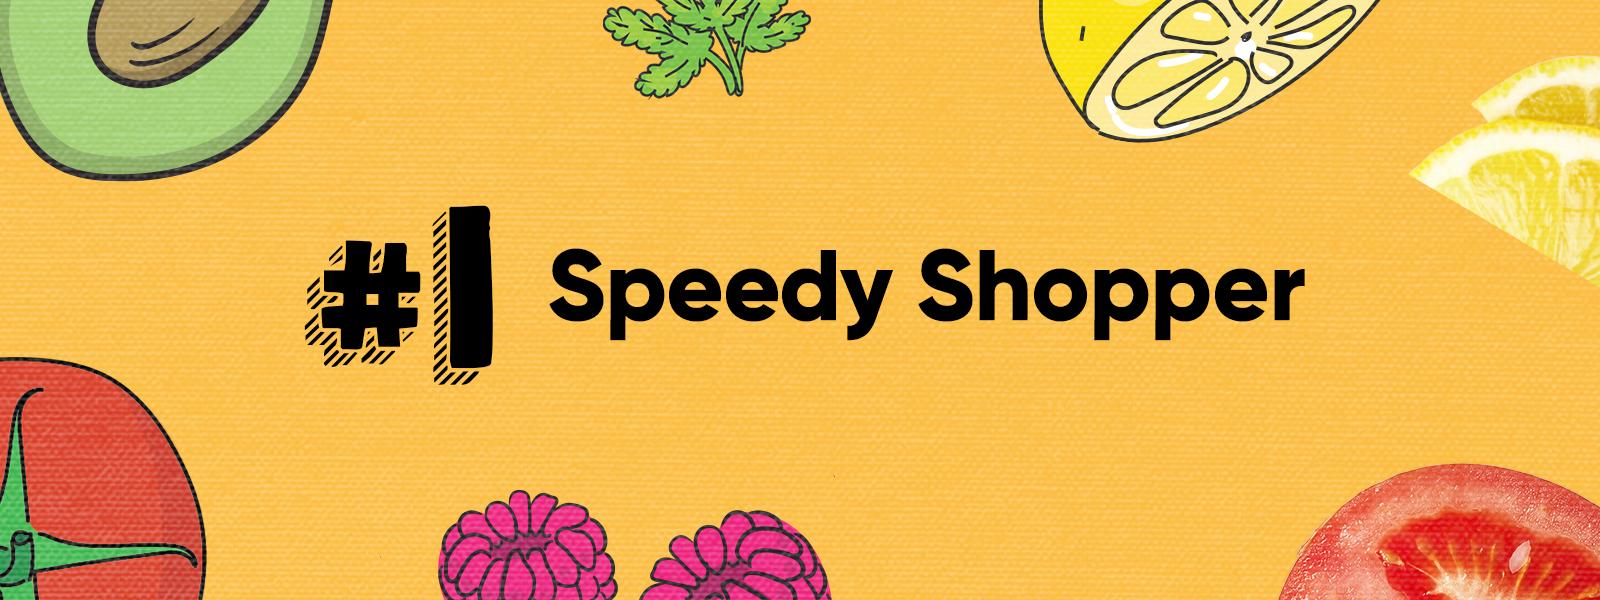 Skill 1: Speedy Shopper